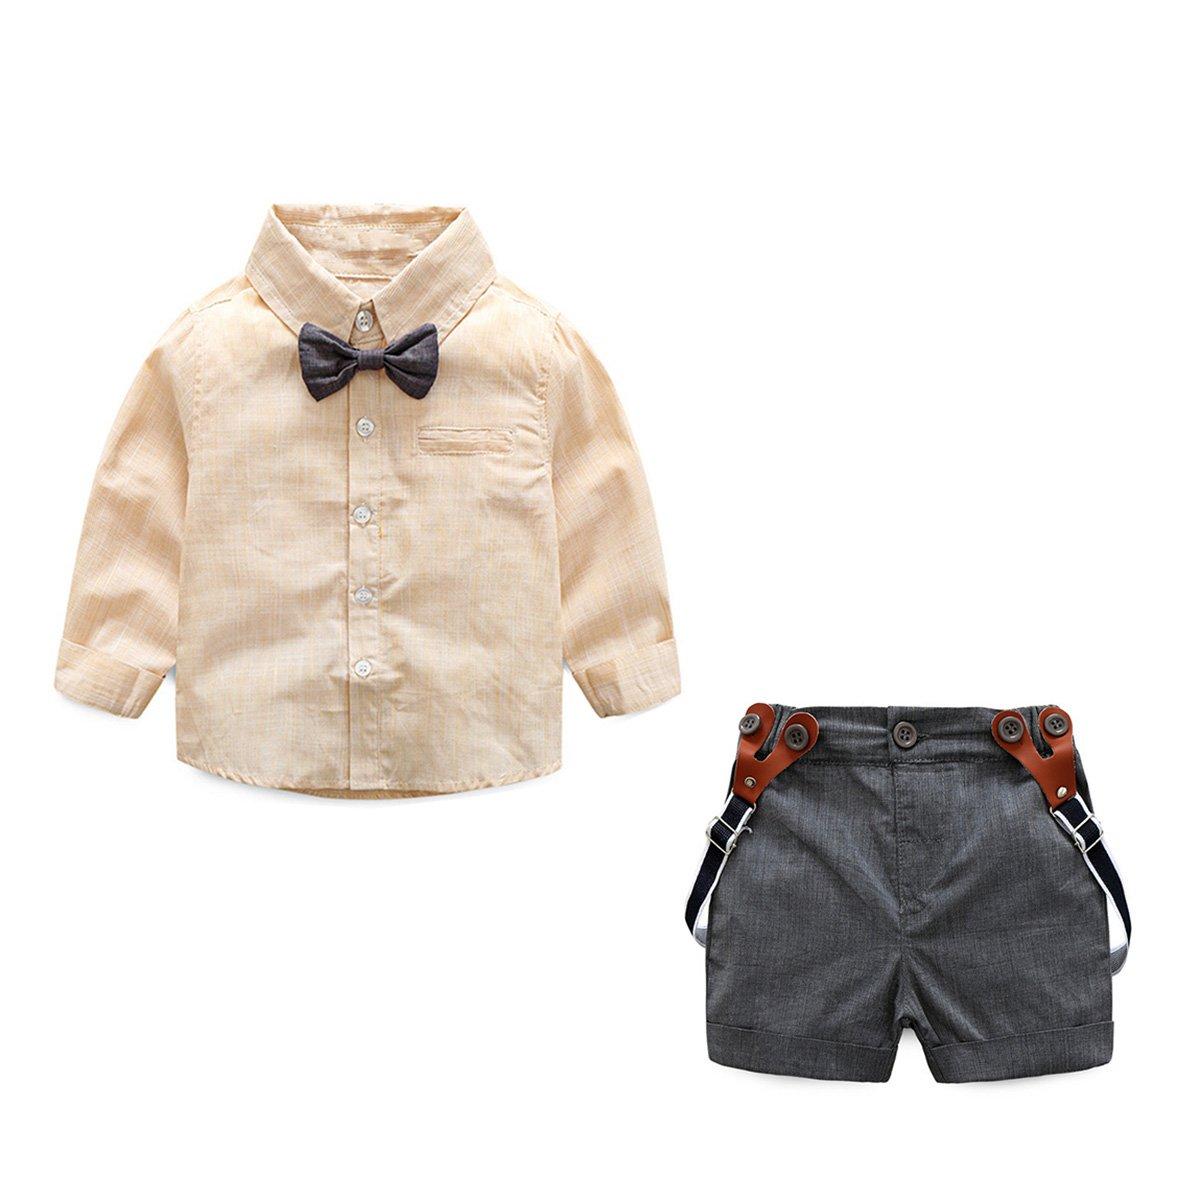 JIANLANPTT Summer Baby Boy Suspender Shorts Outfits Set Bowtie Shirt Wedding Outfits Apricot 6-12months